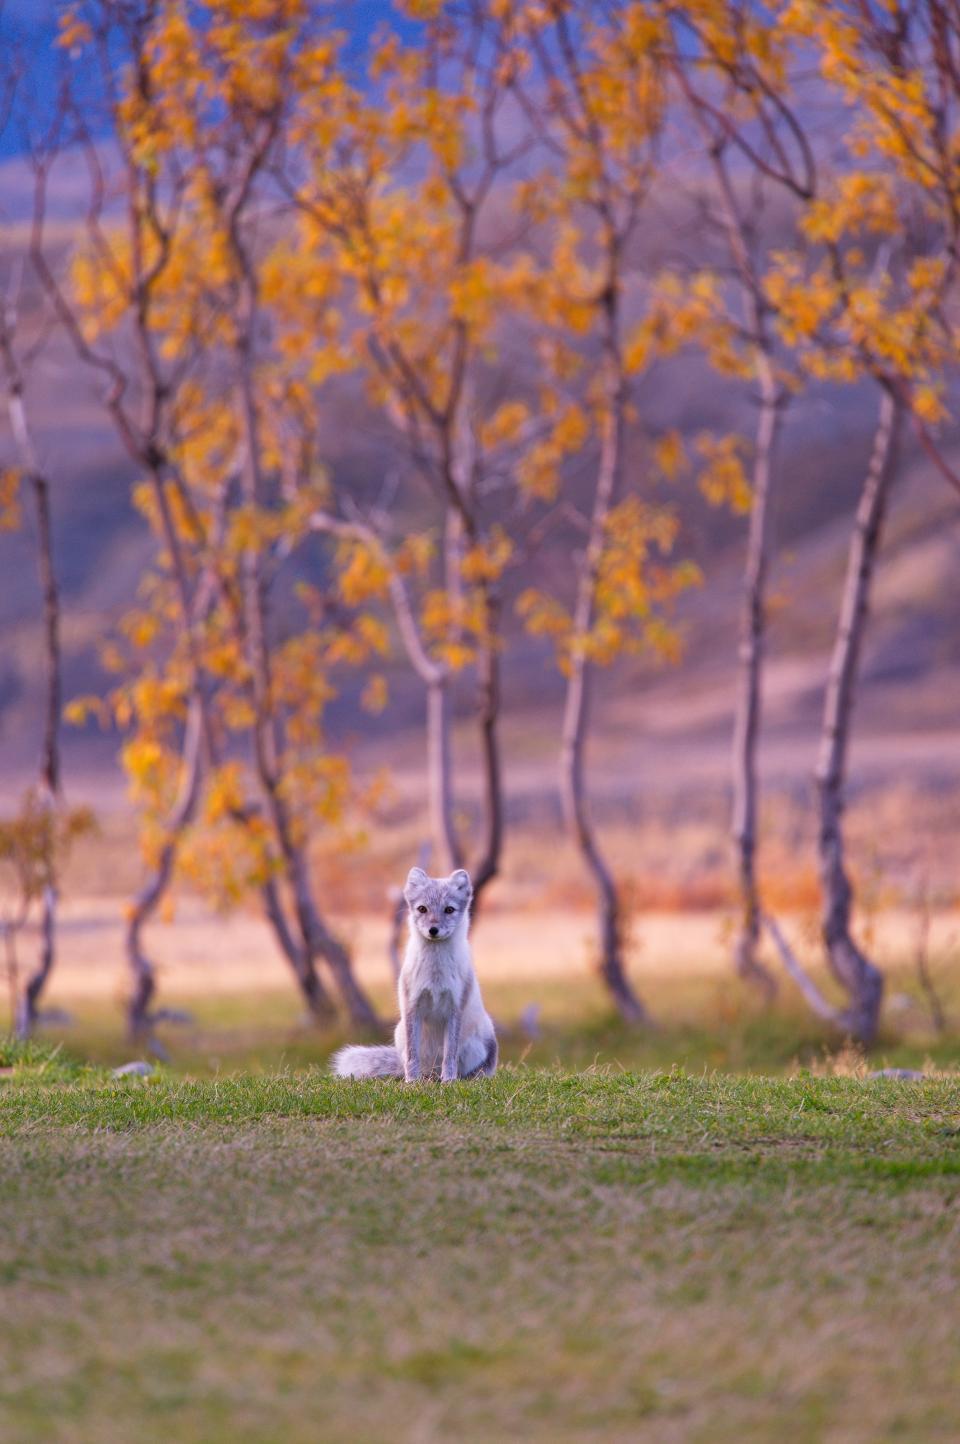 dog, puppy, animal, pet, playground, grass, autumn, fall, trees, nature, mountain